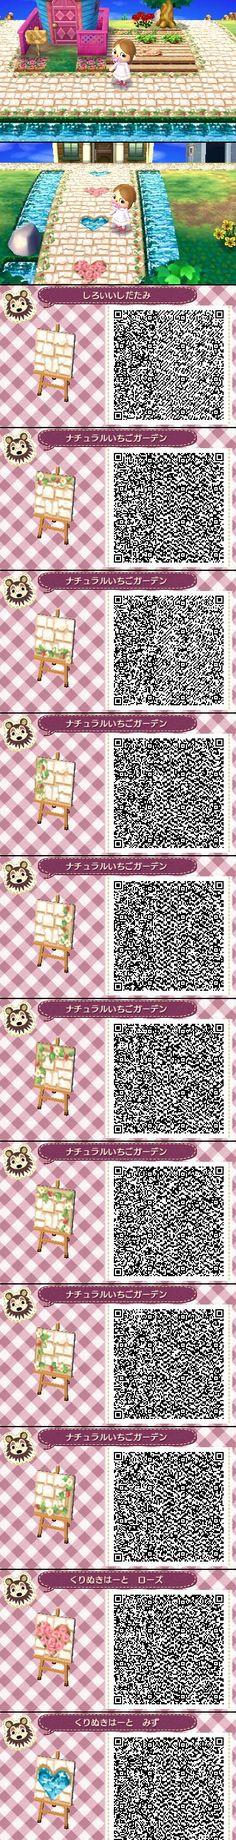 Animal Crossing New Leaf QR codes Pathway